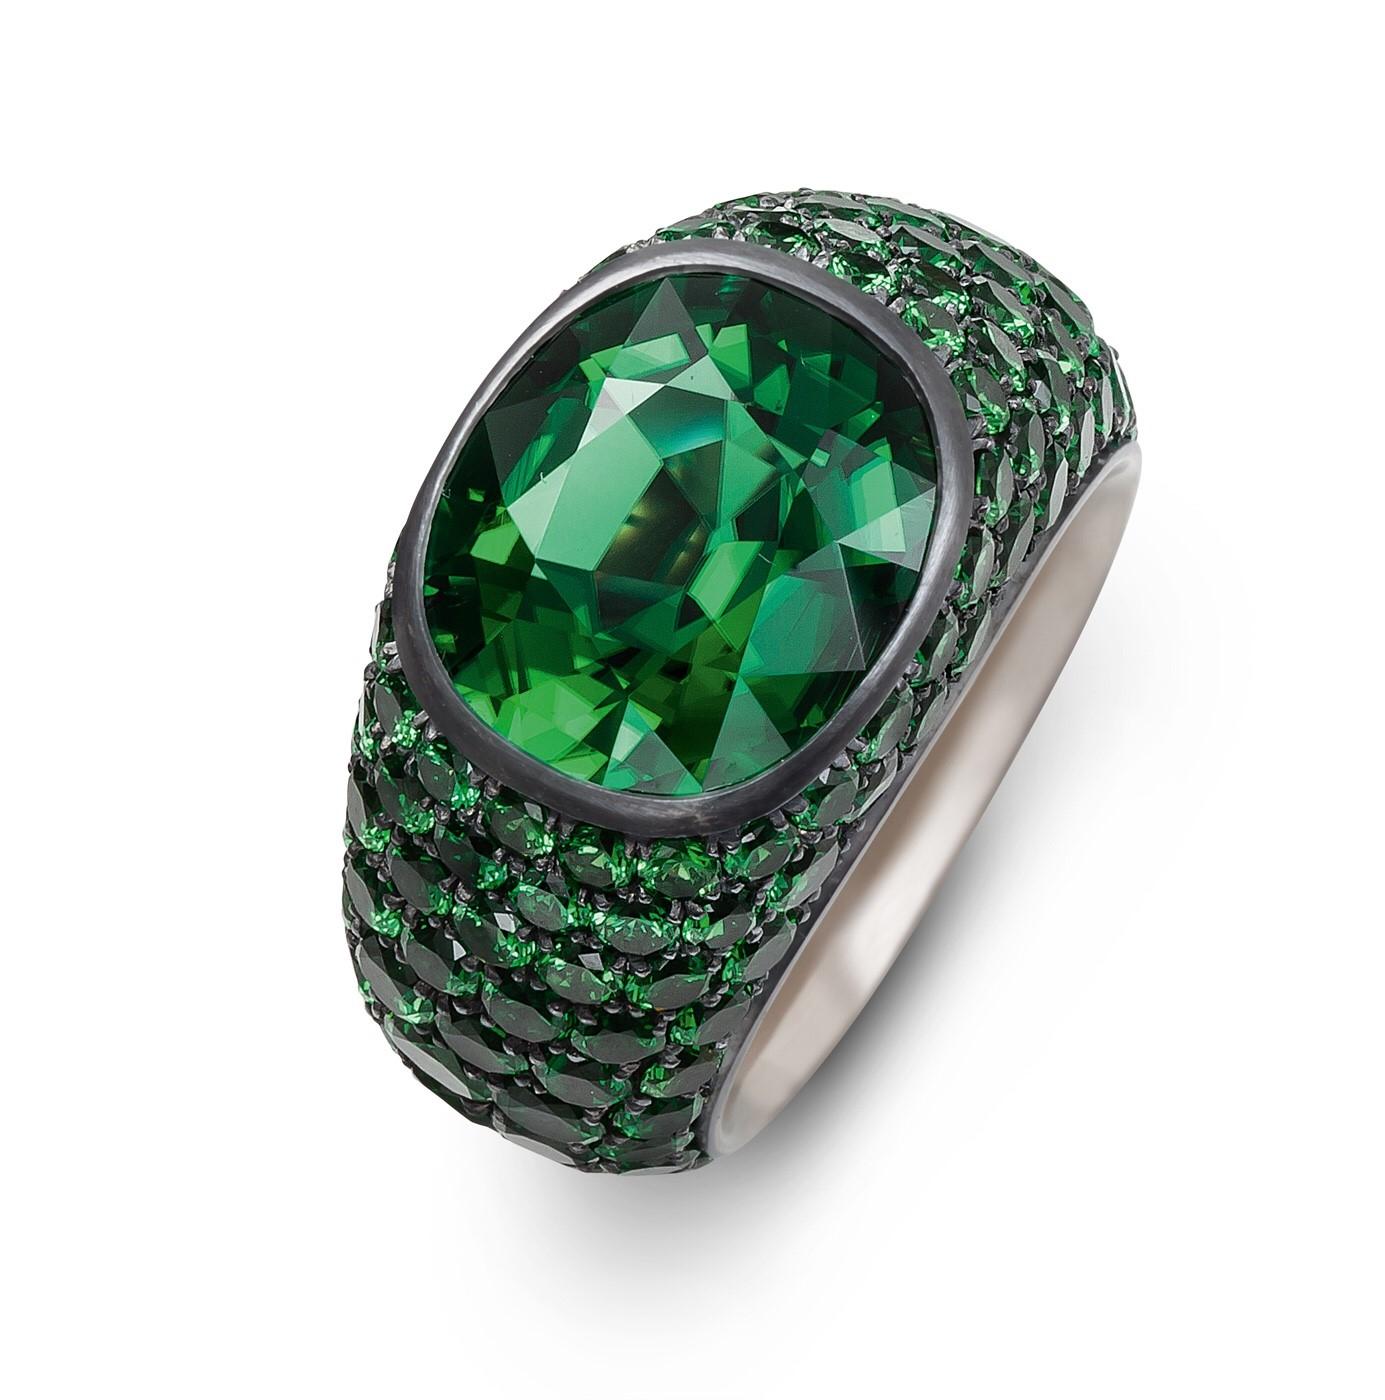 hemmerle-ring-tsavorites-tourmaline-gold-silver-0749-13